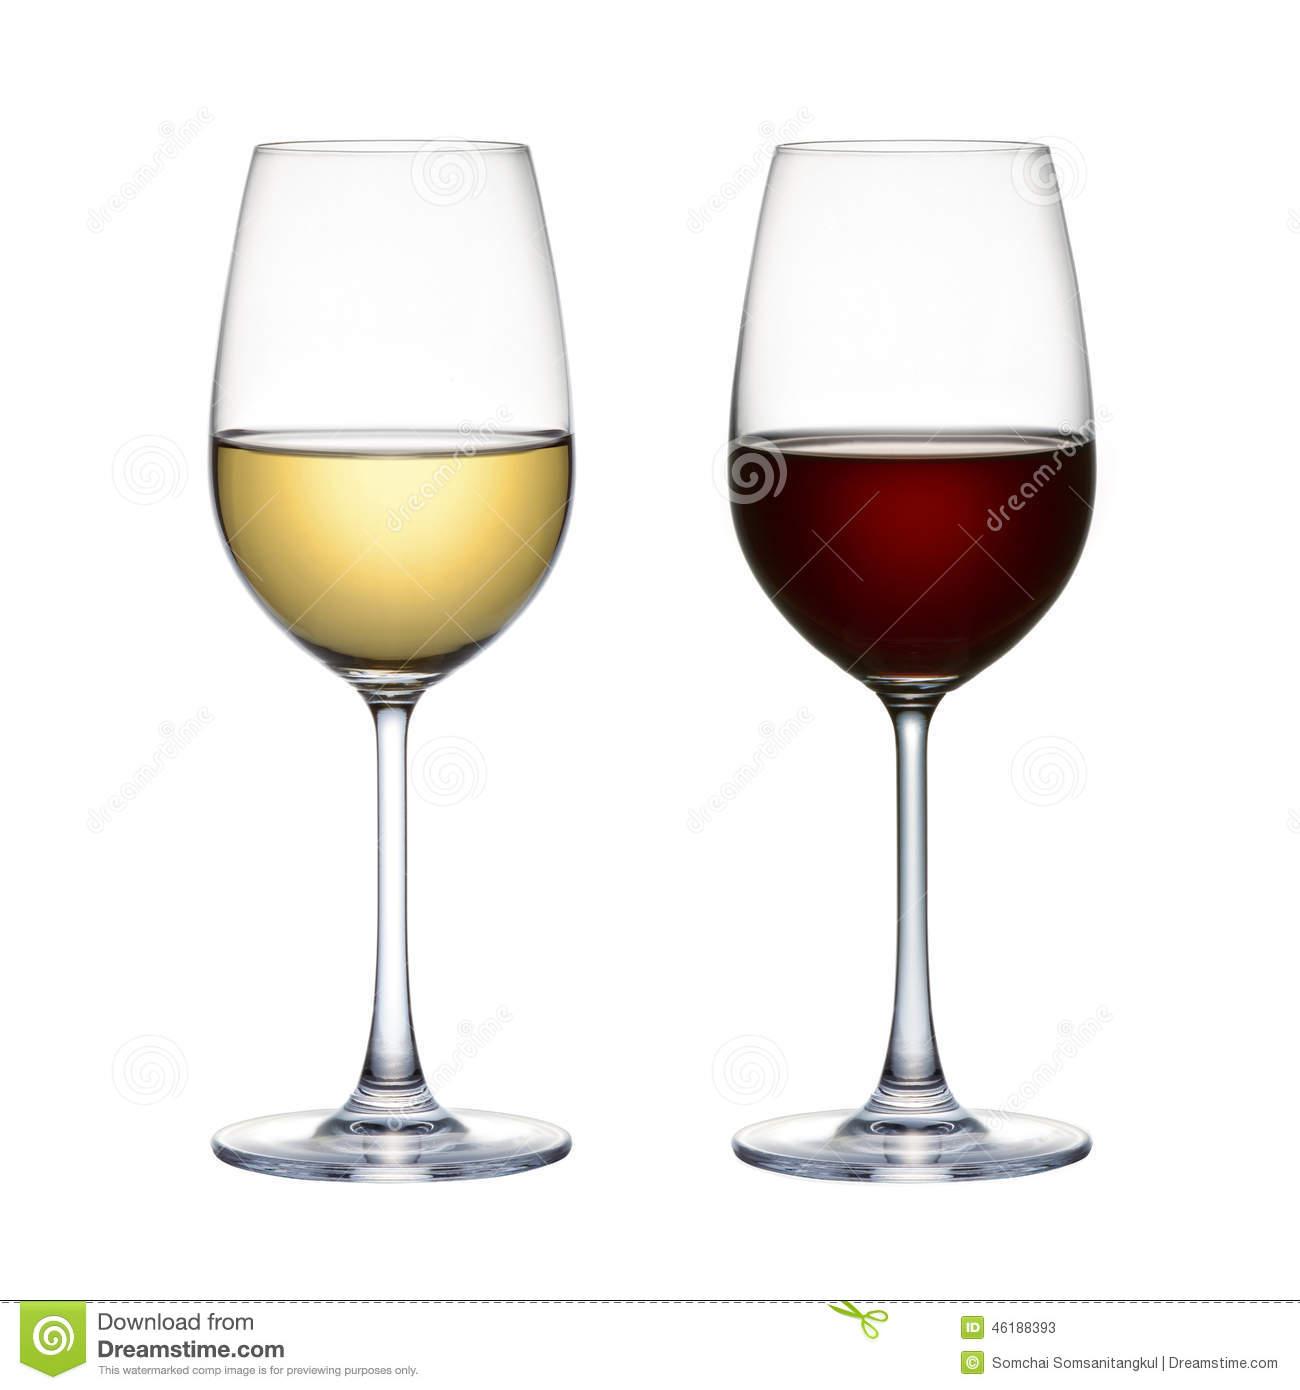 verre de vin rouge meaning